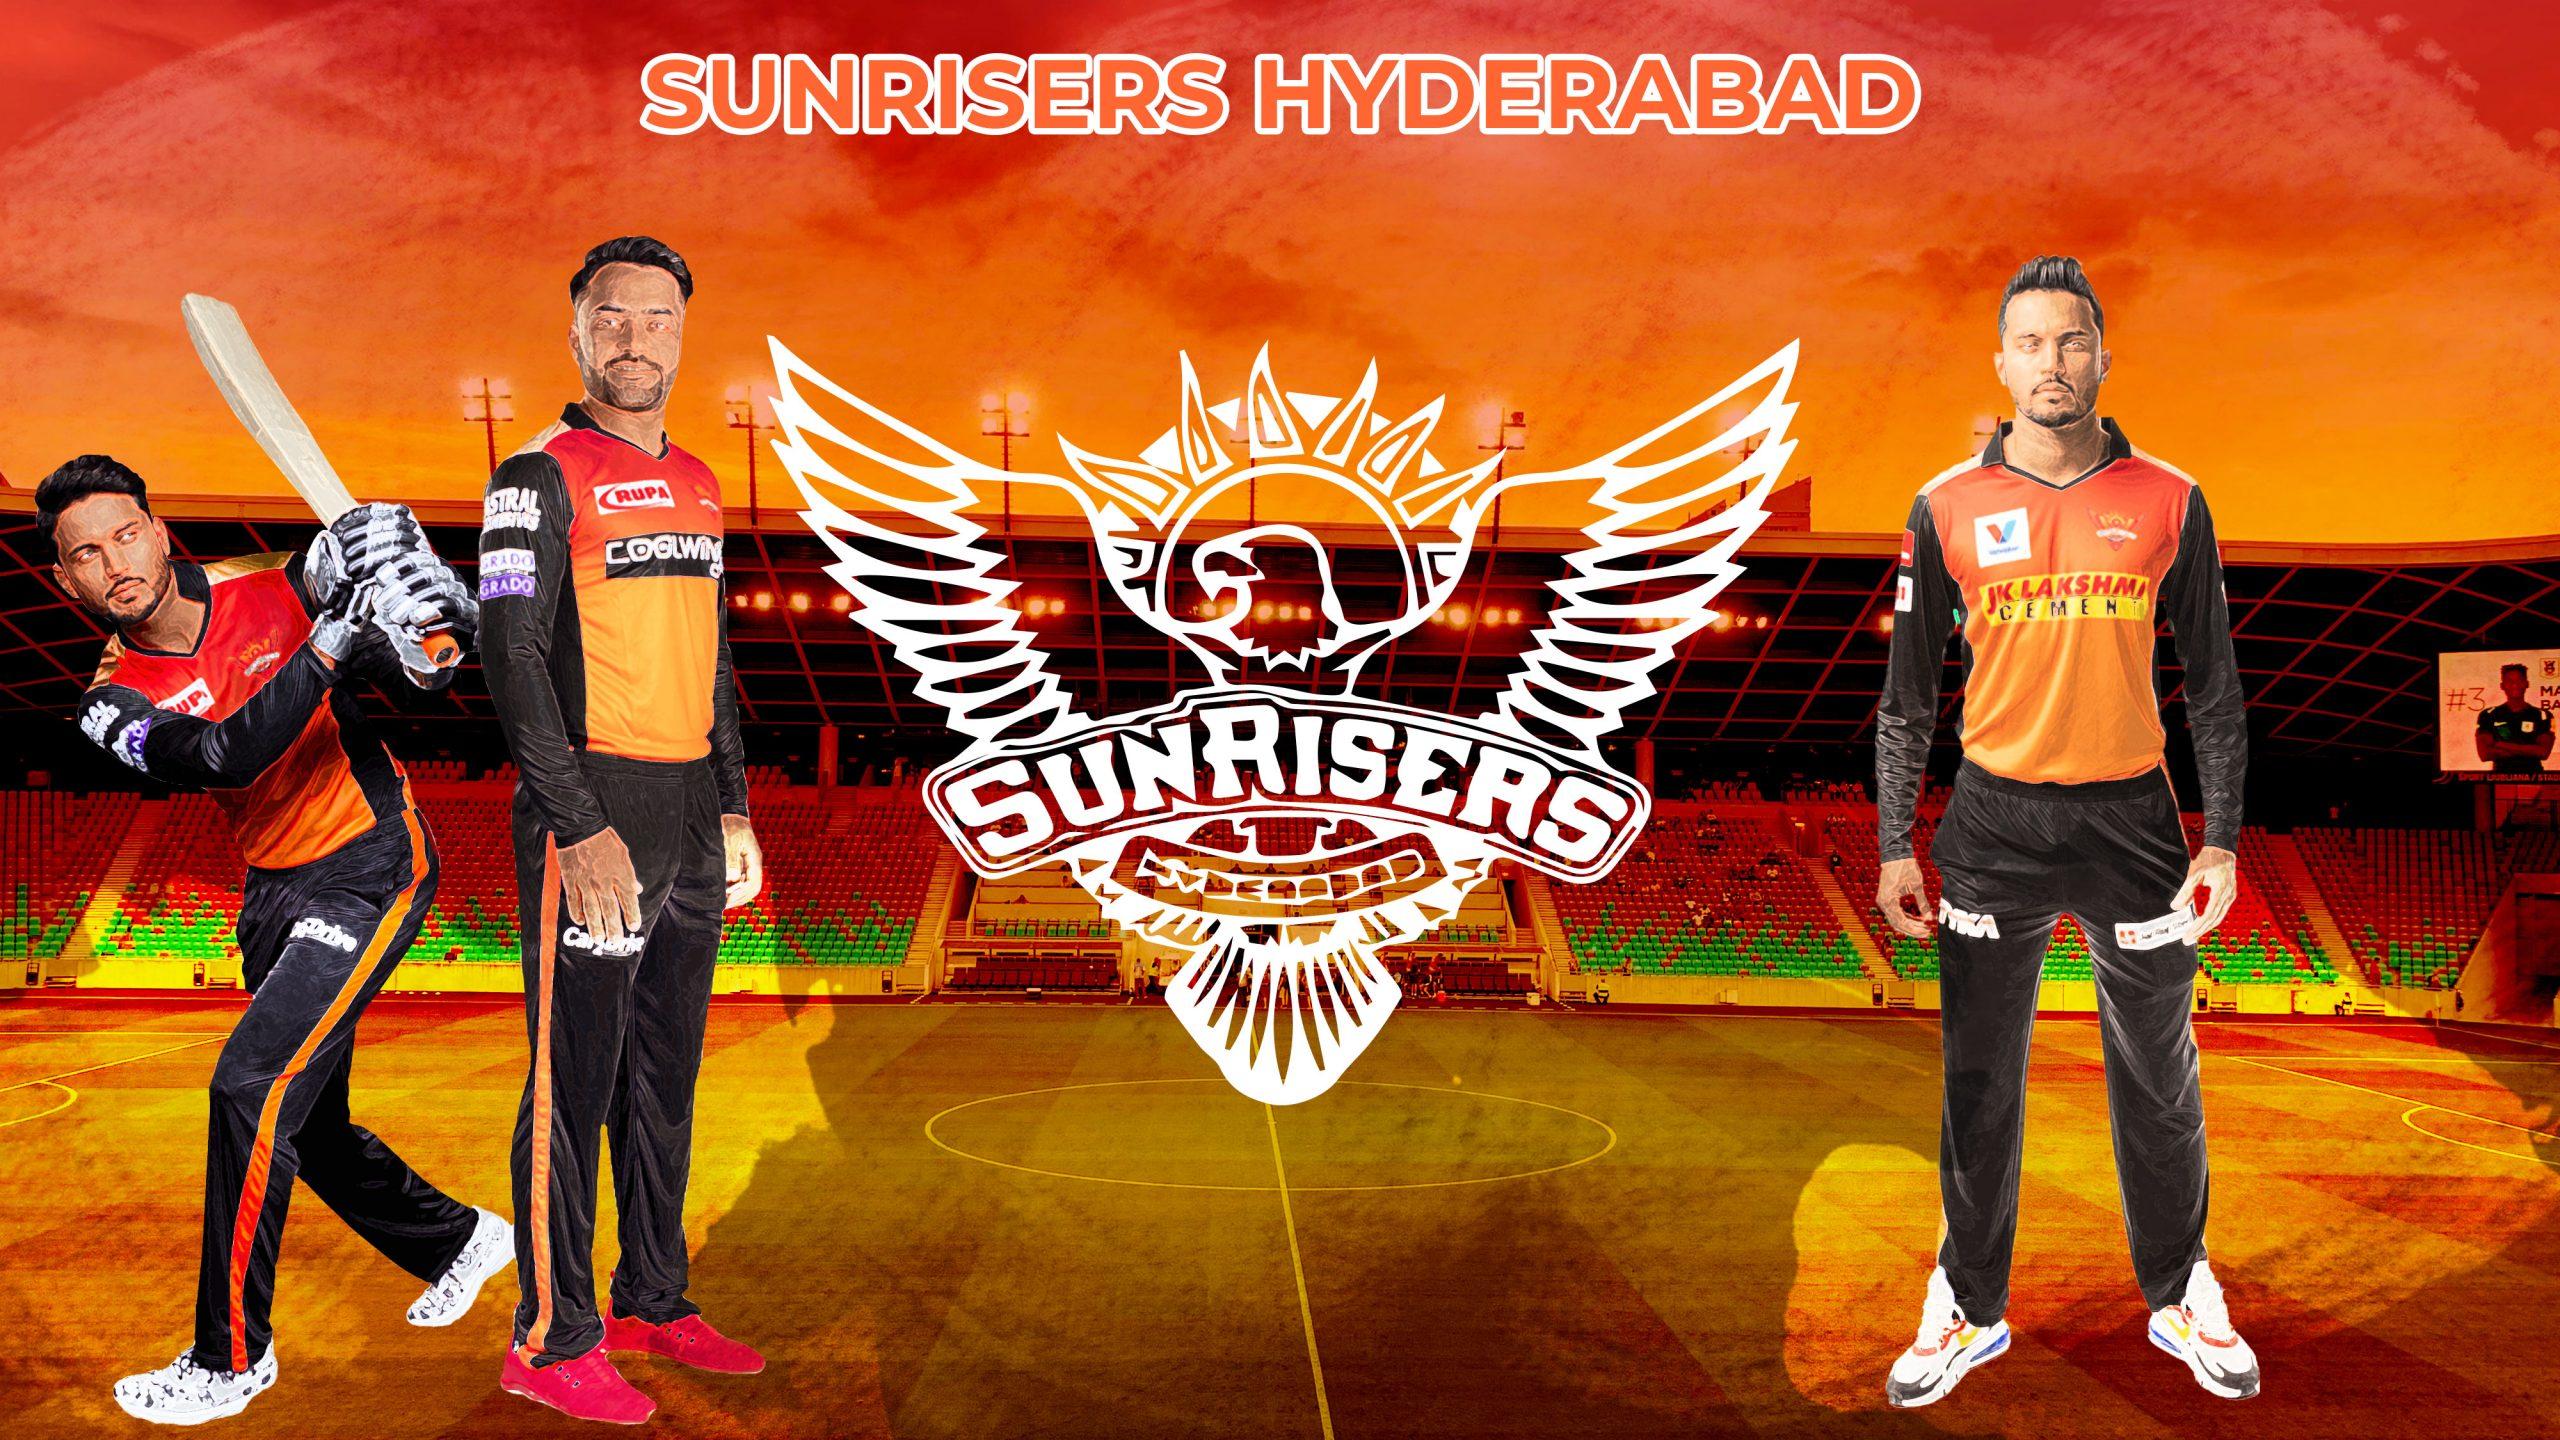 Illustration of Sunrisers Hyderabad logo and player